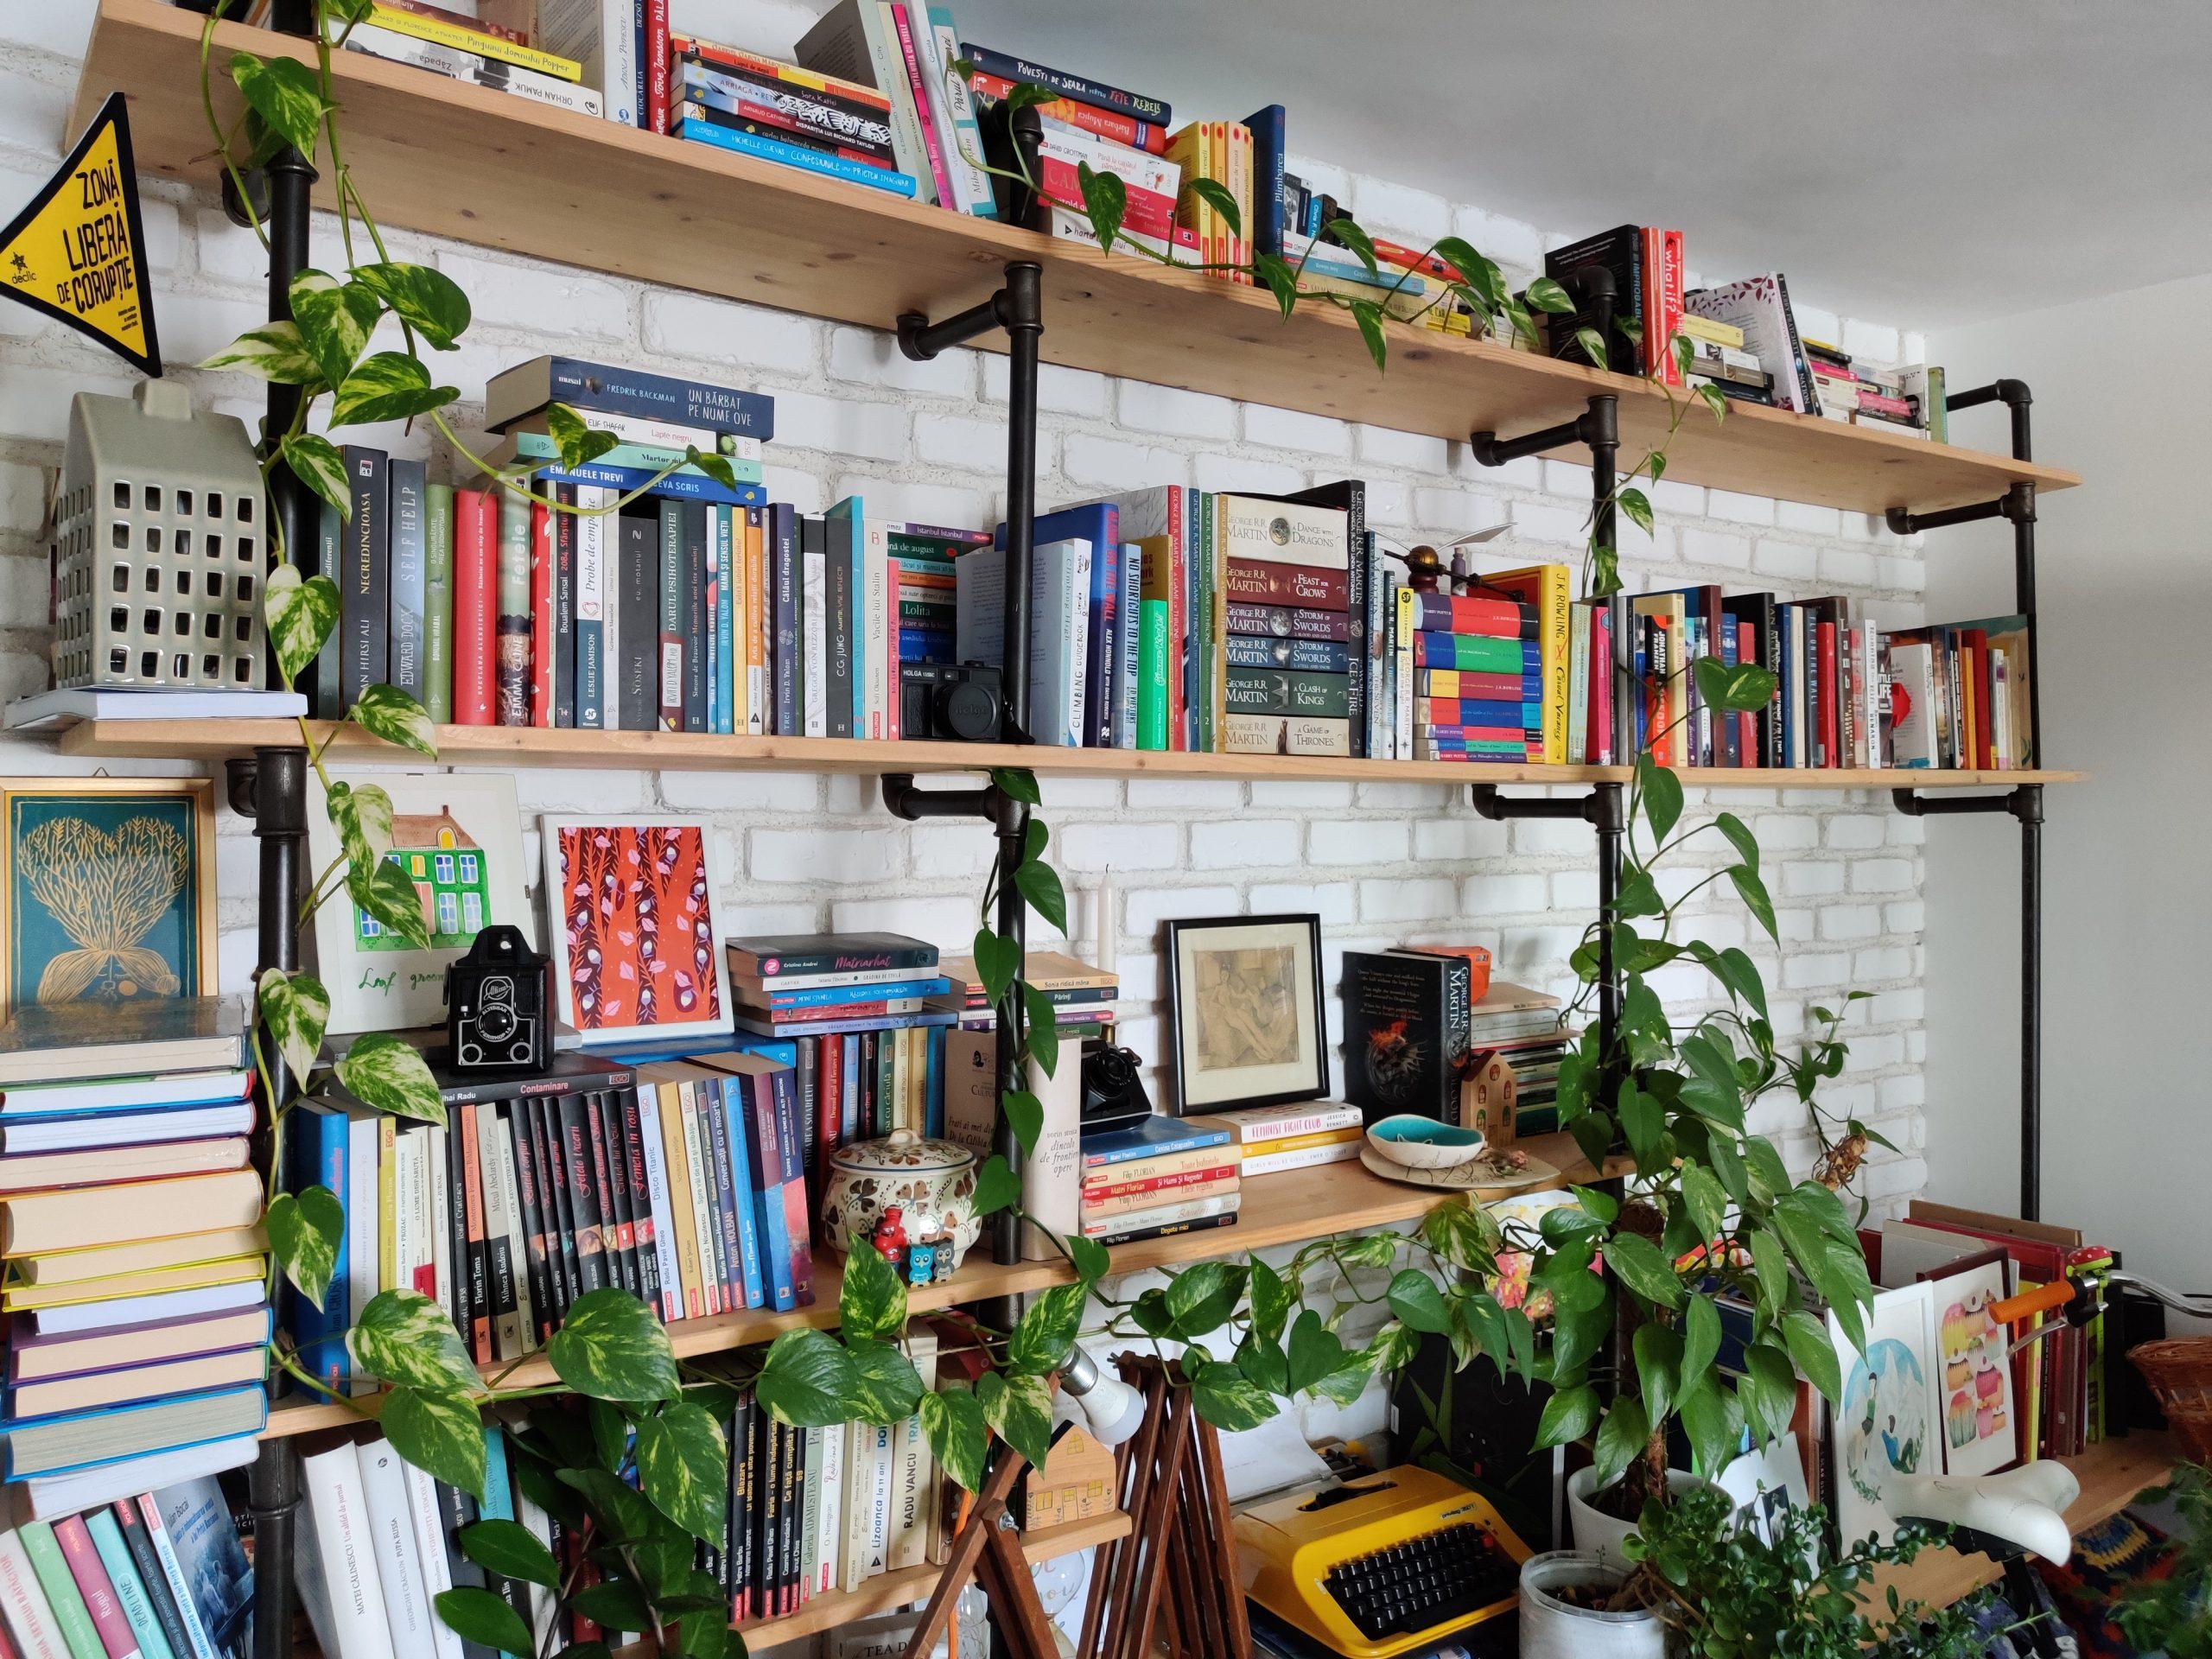 multe plante